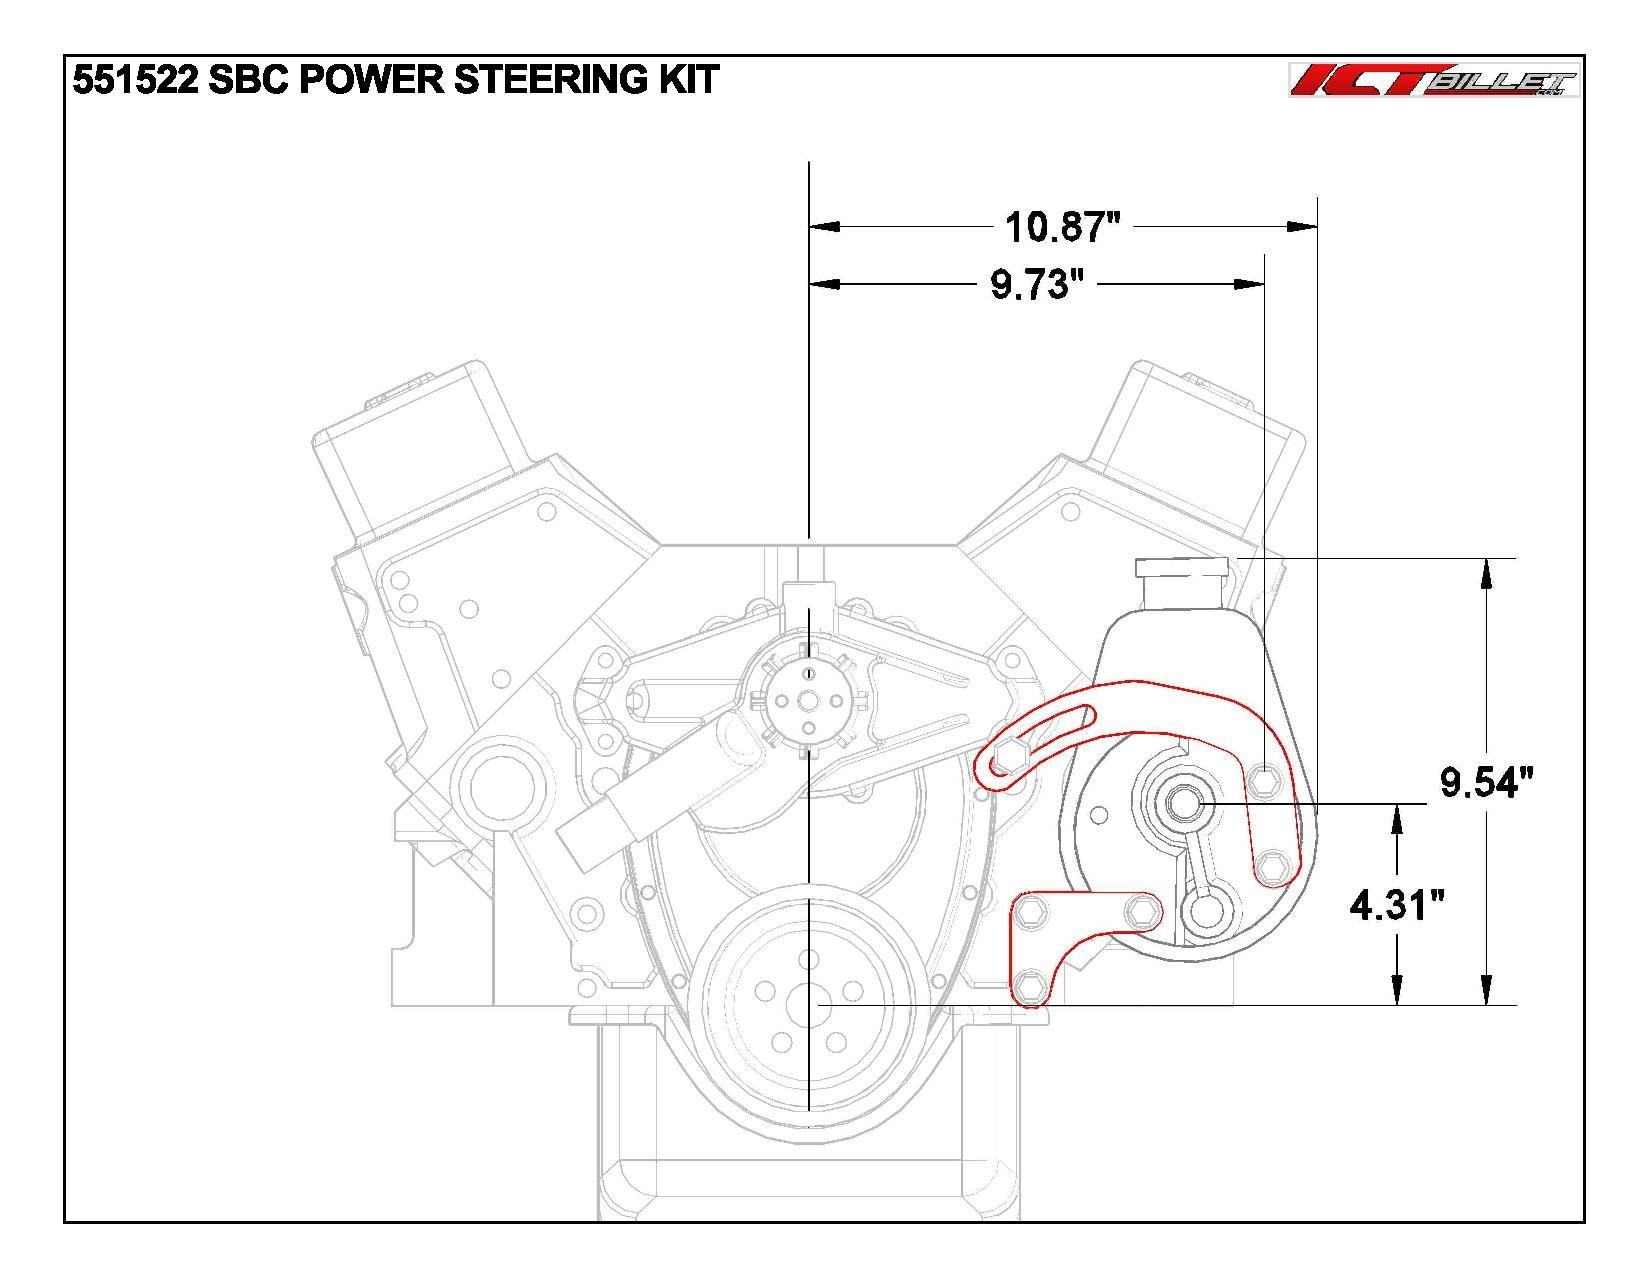 Sbc Billet Adjustable Alternator Power Steering Bracket